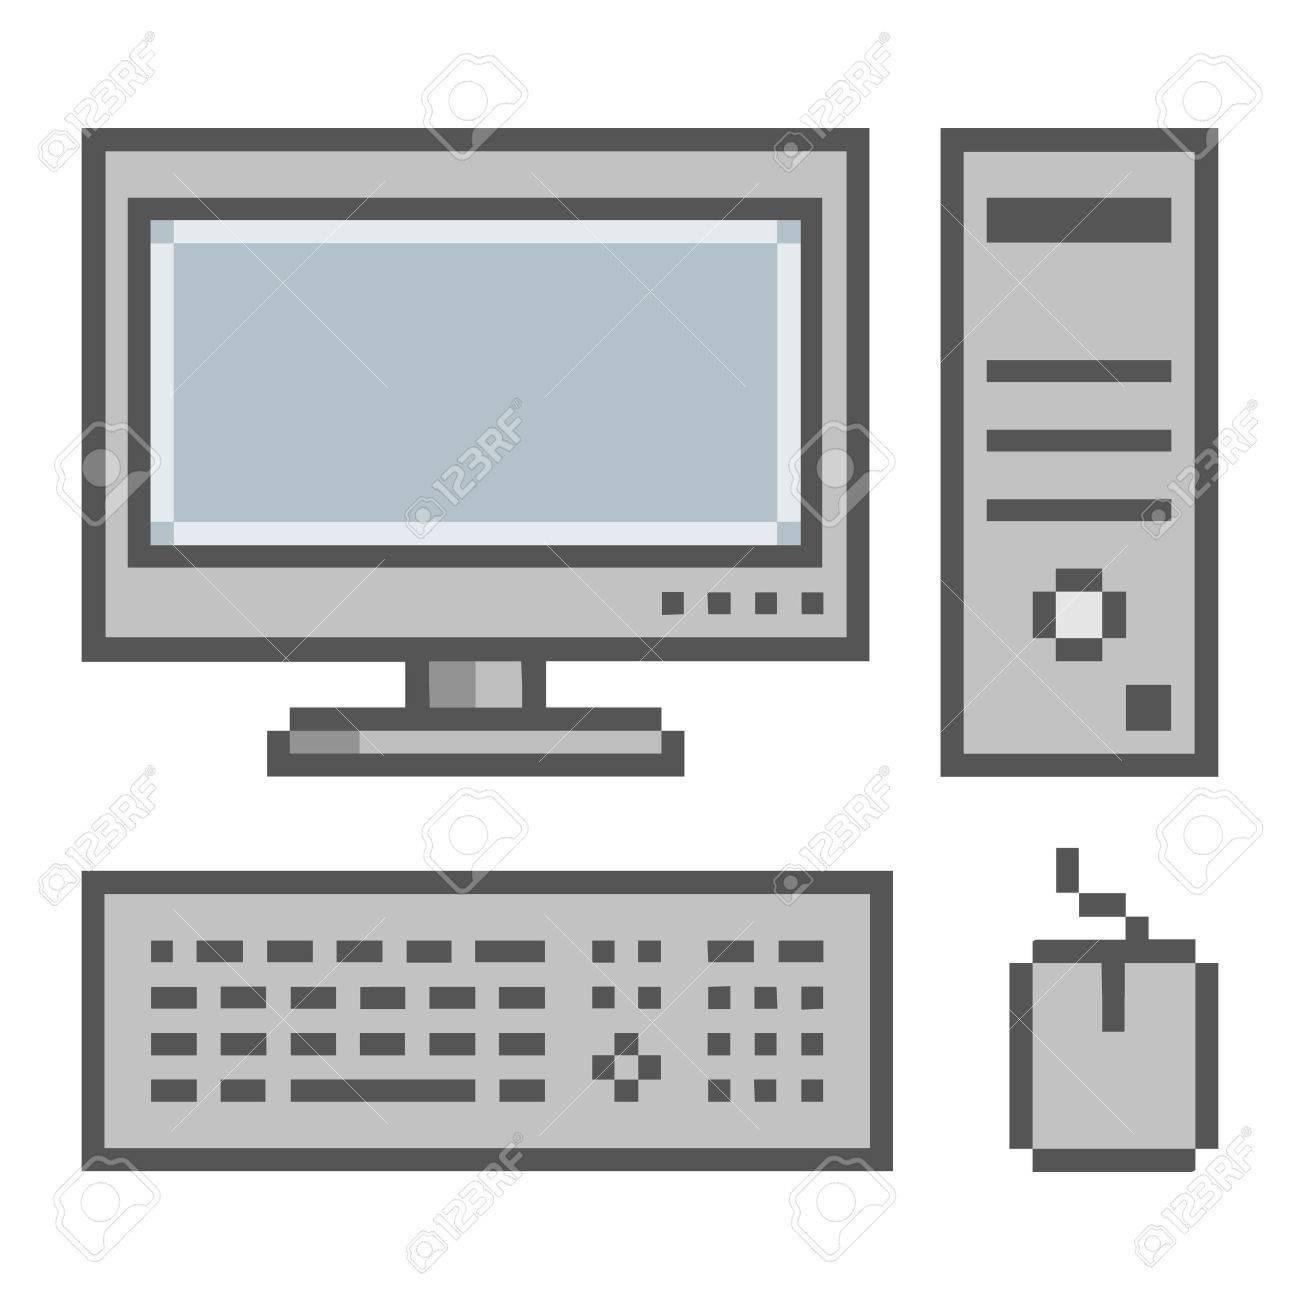 pixel art ordinateur